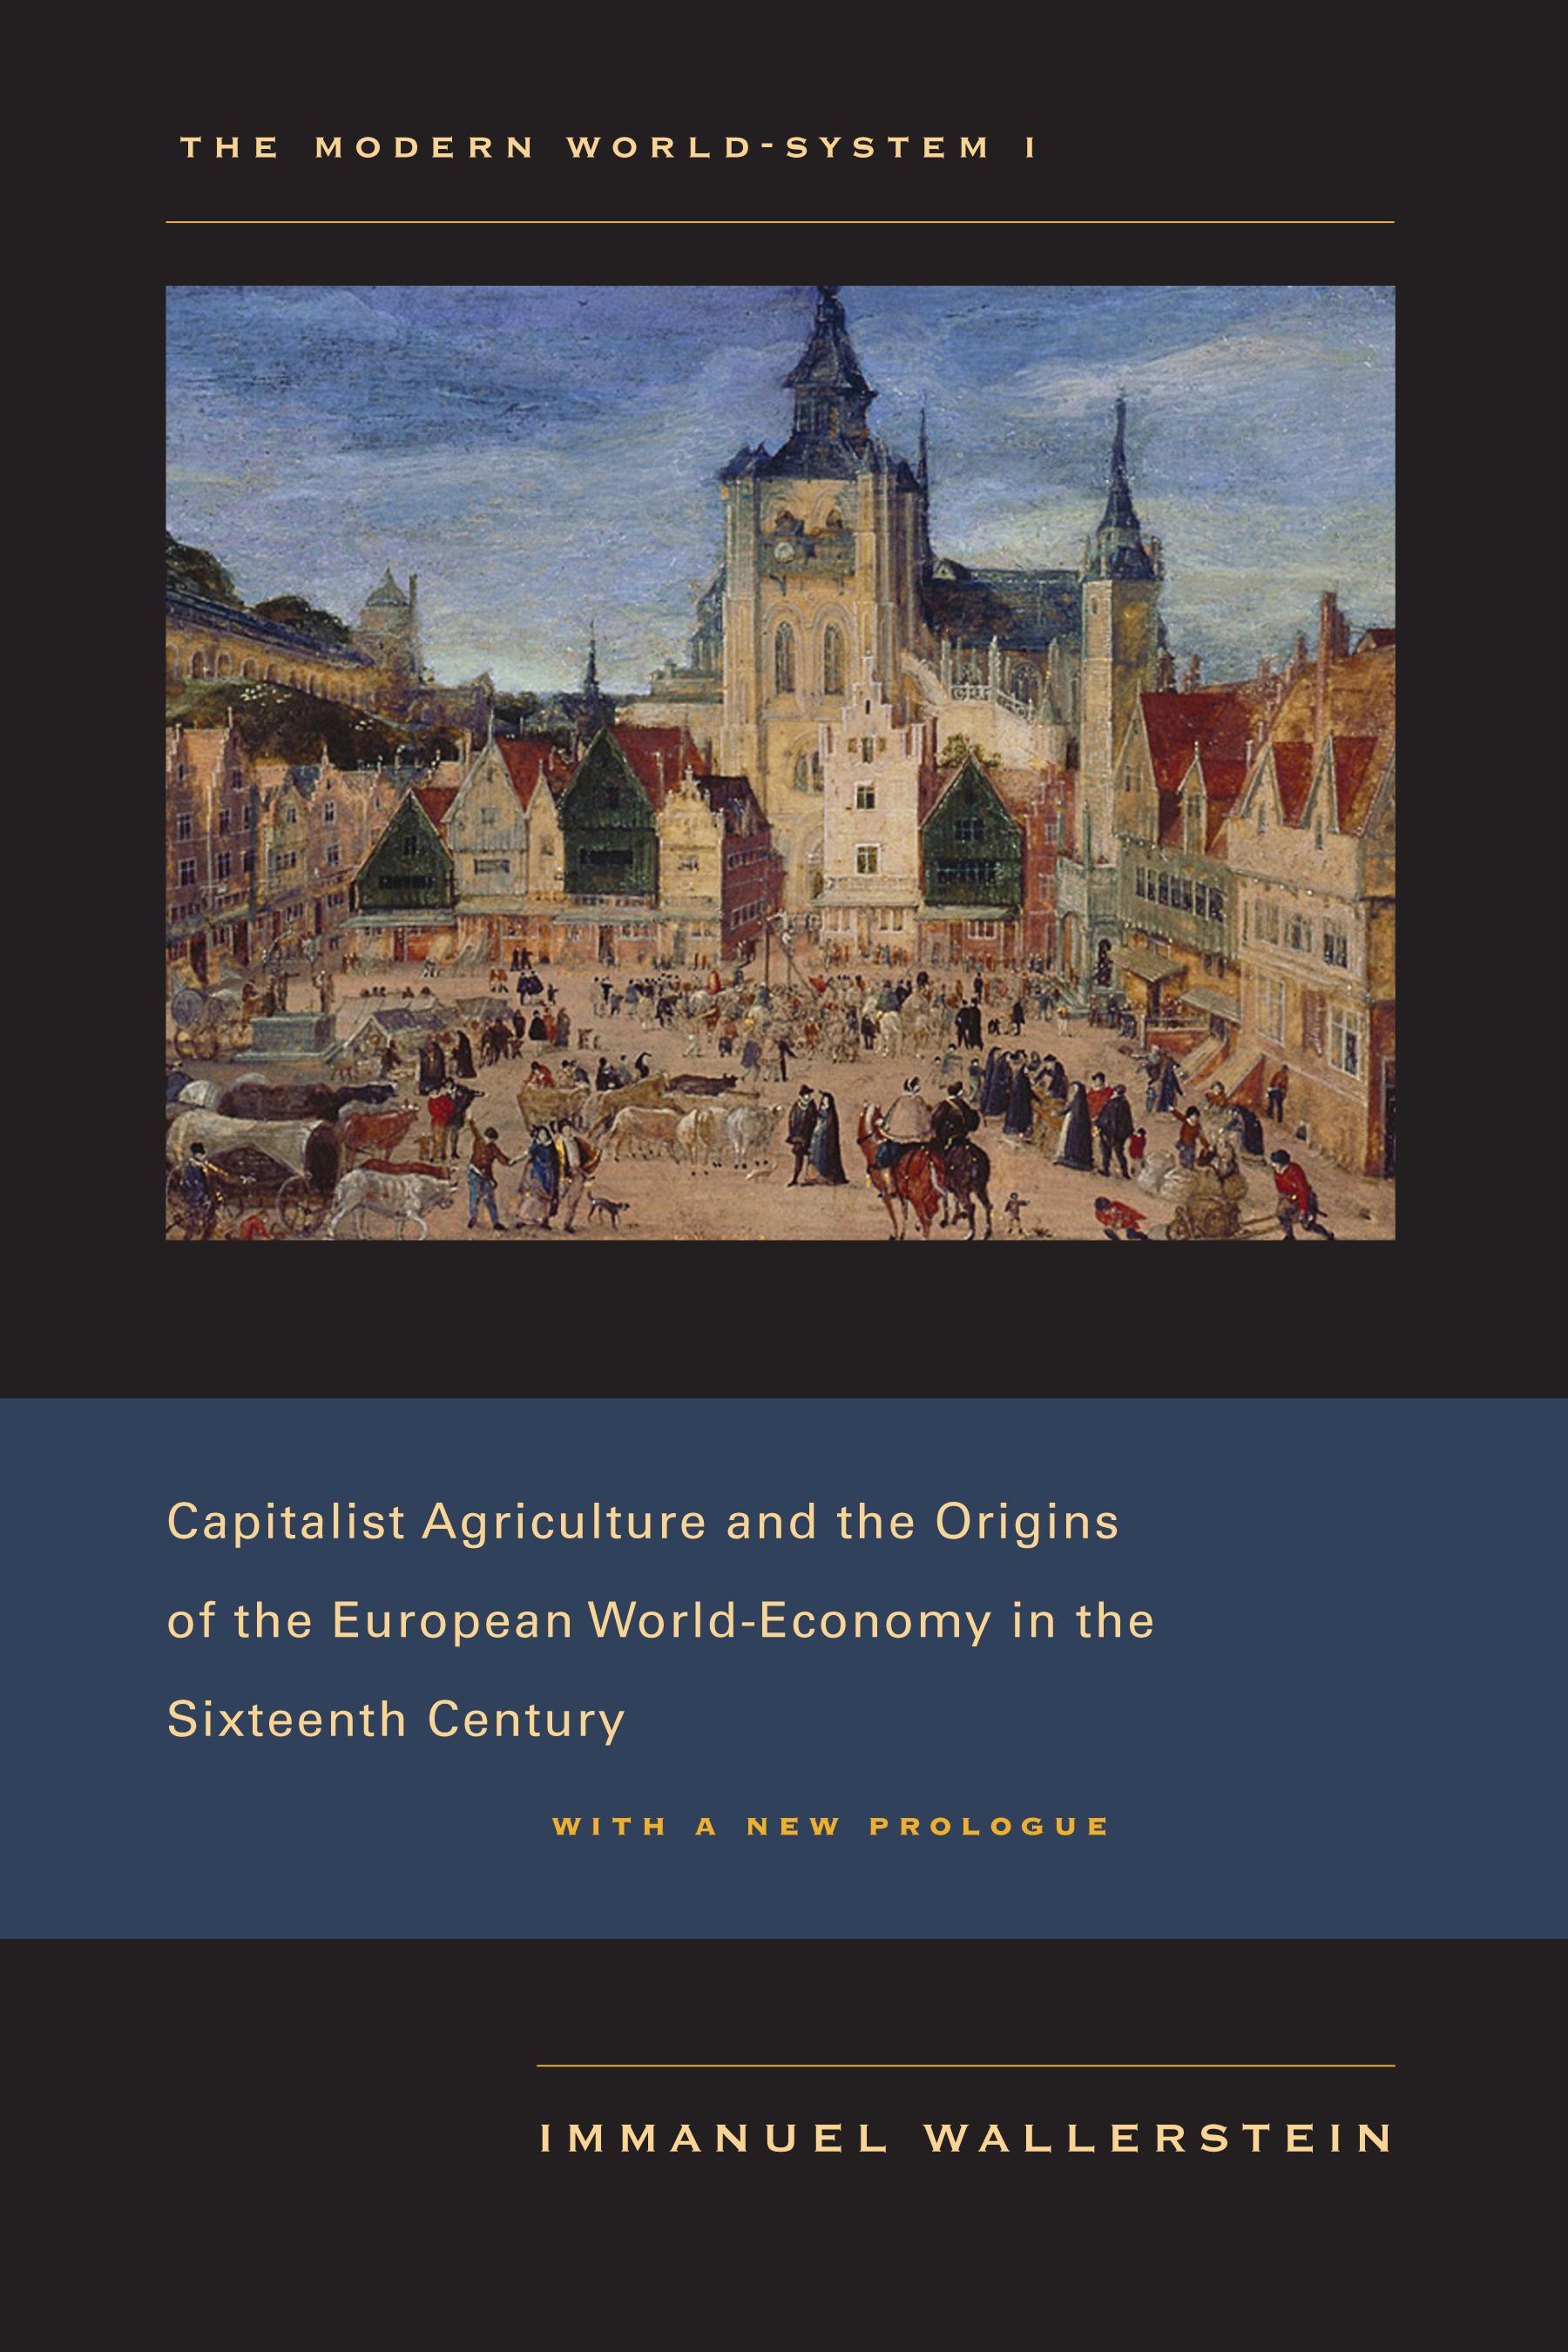 Download Ebook The Modern World-System I by Immanuel Wallerstein Pdf